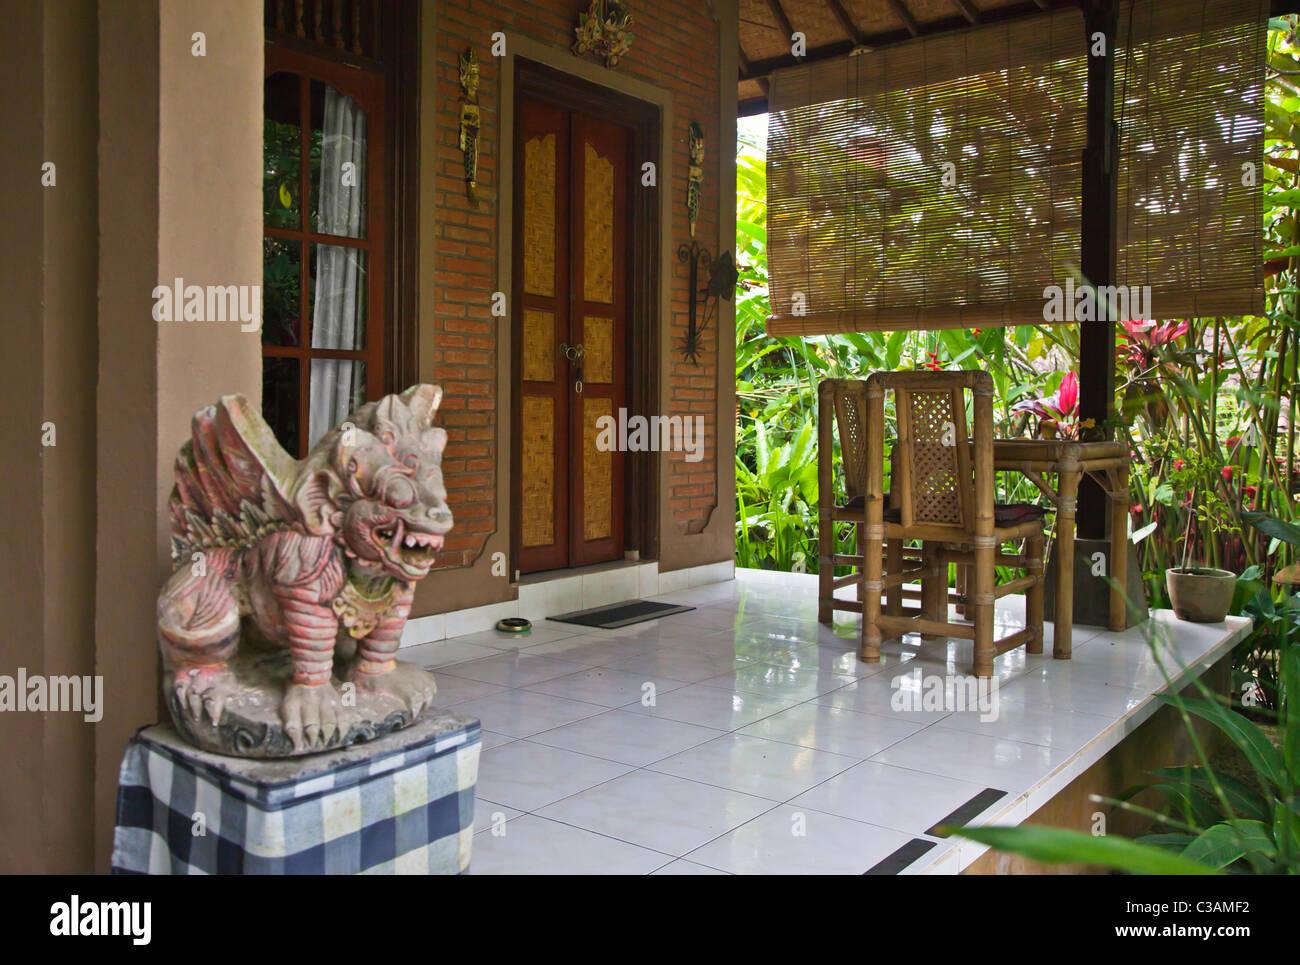 Balinese Design Stock Photos & Balinese Design Stock Images - Alamy